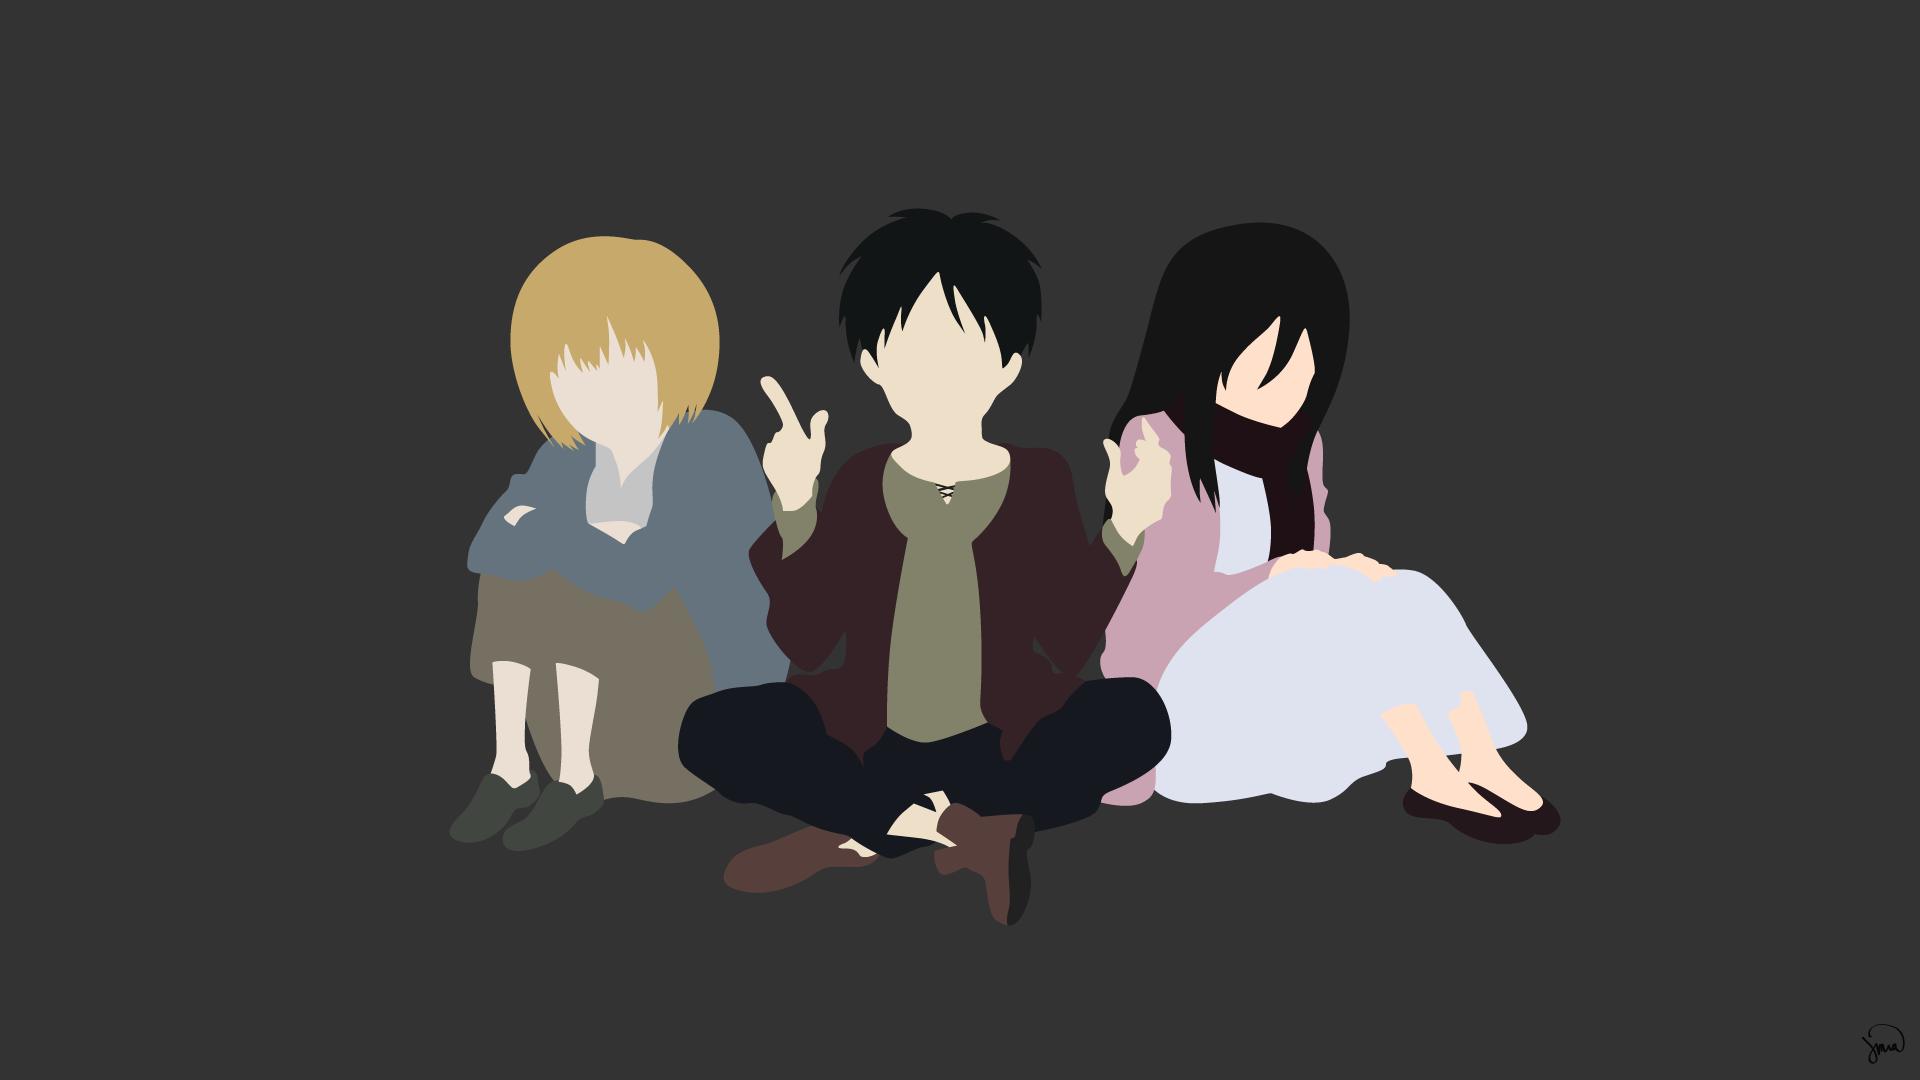 Armin Eren And Mikasa Hd Wallpaper Background Image 1920x1080